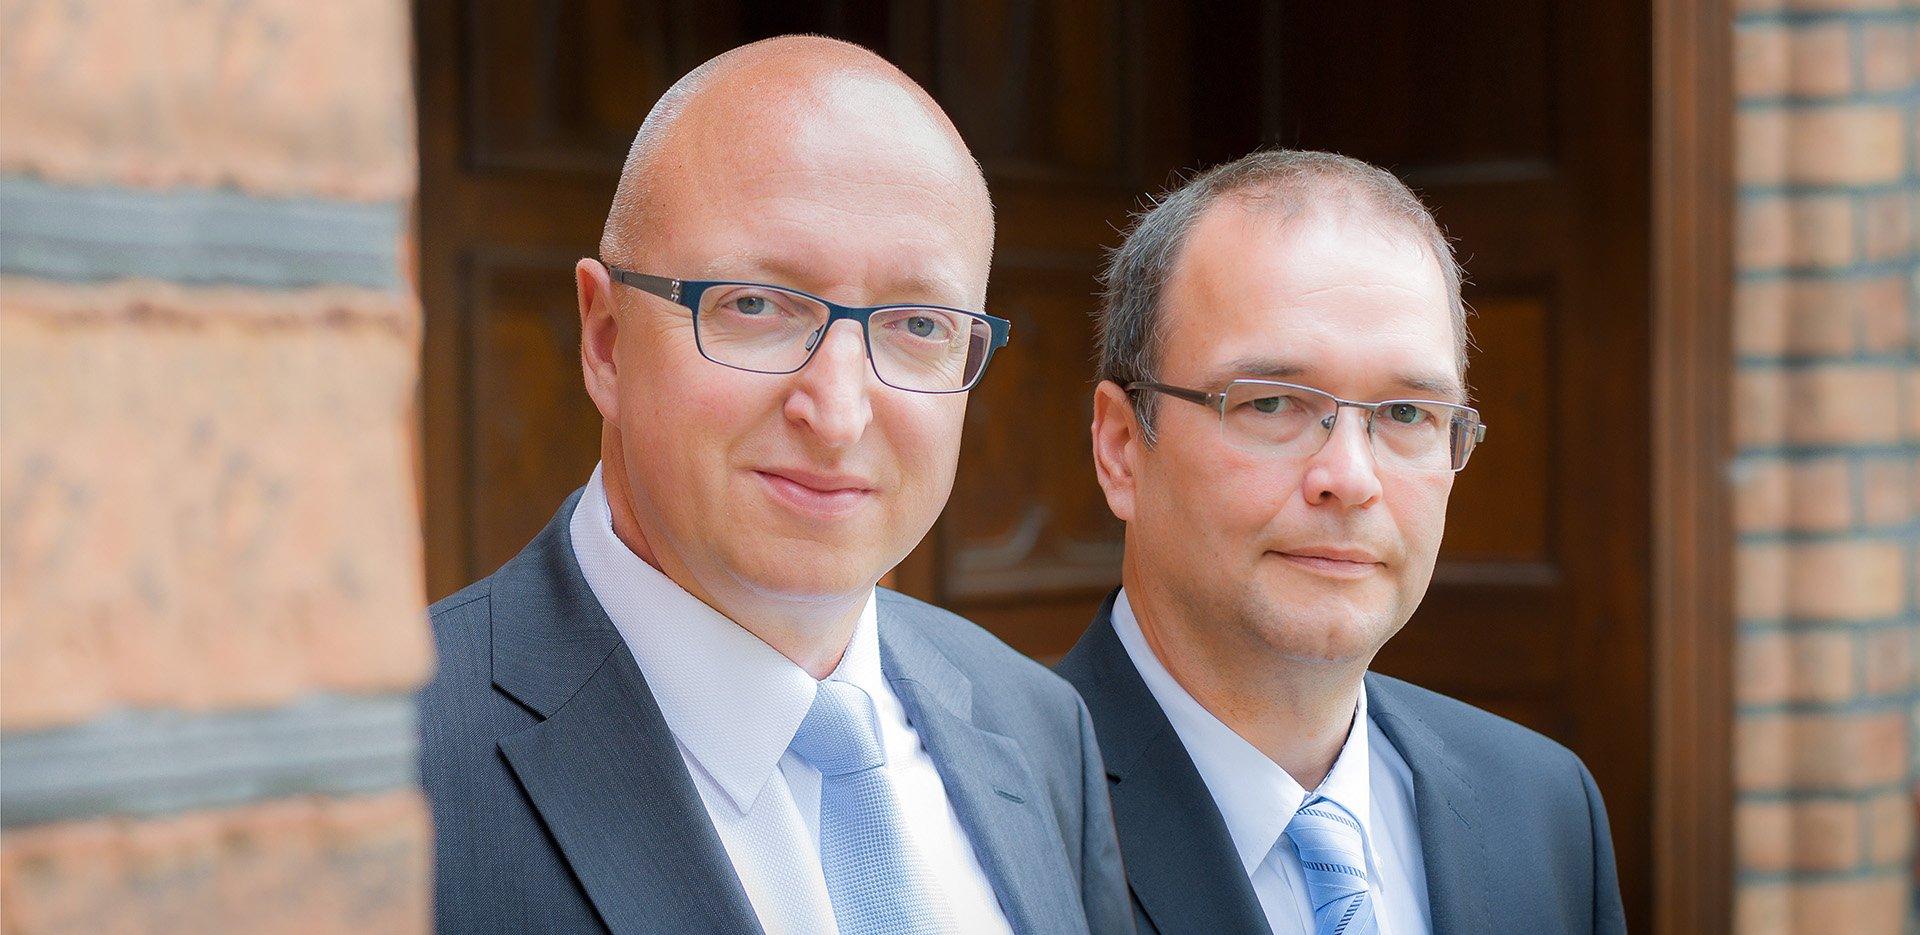 Hebenstreit & Renke